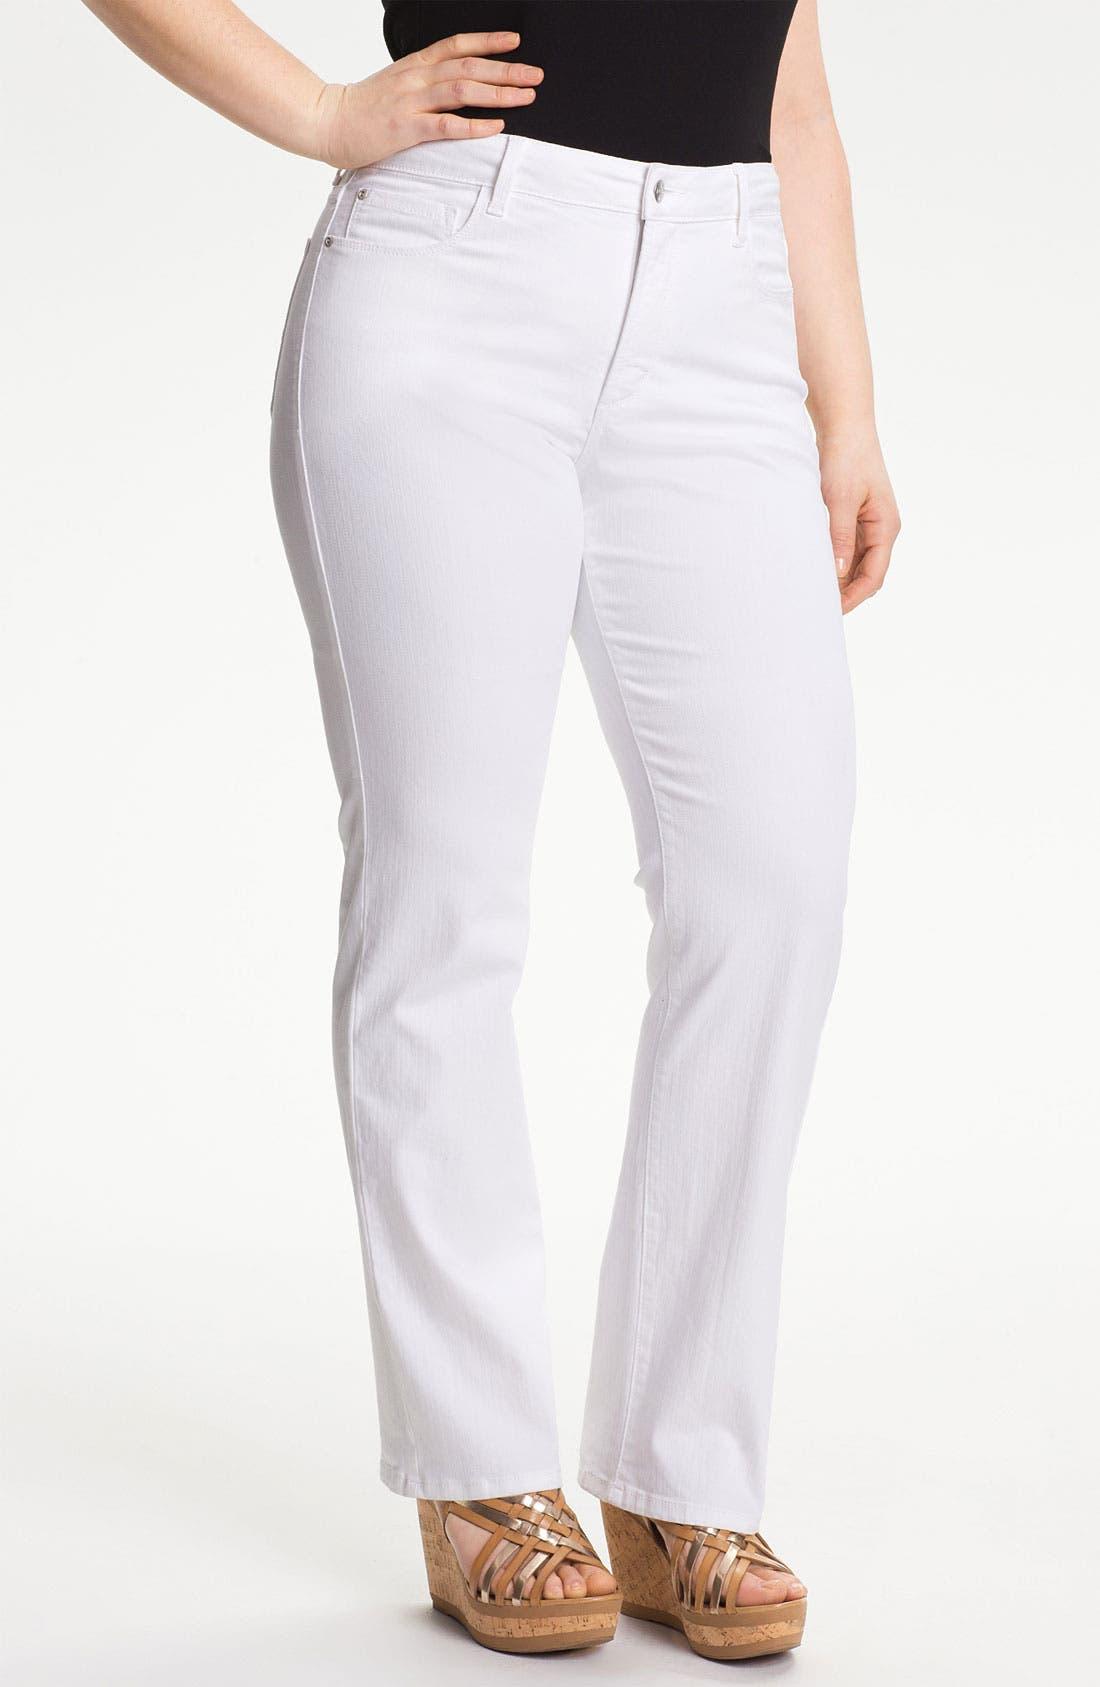 Main Image - NYDJ Embellished Straight Jeans (Plus Size)